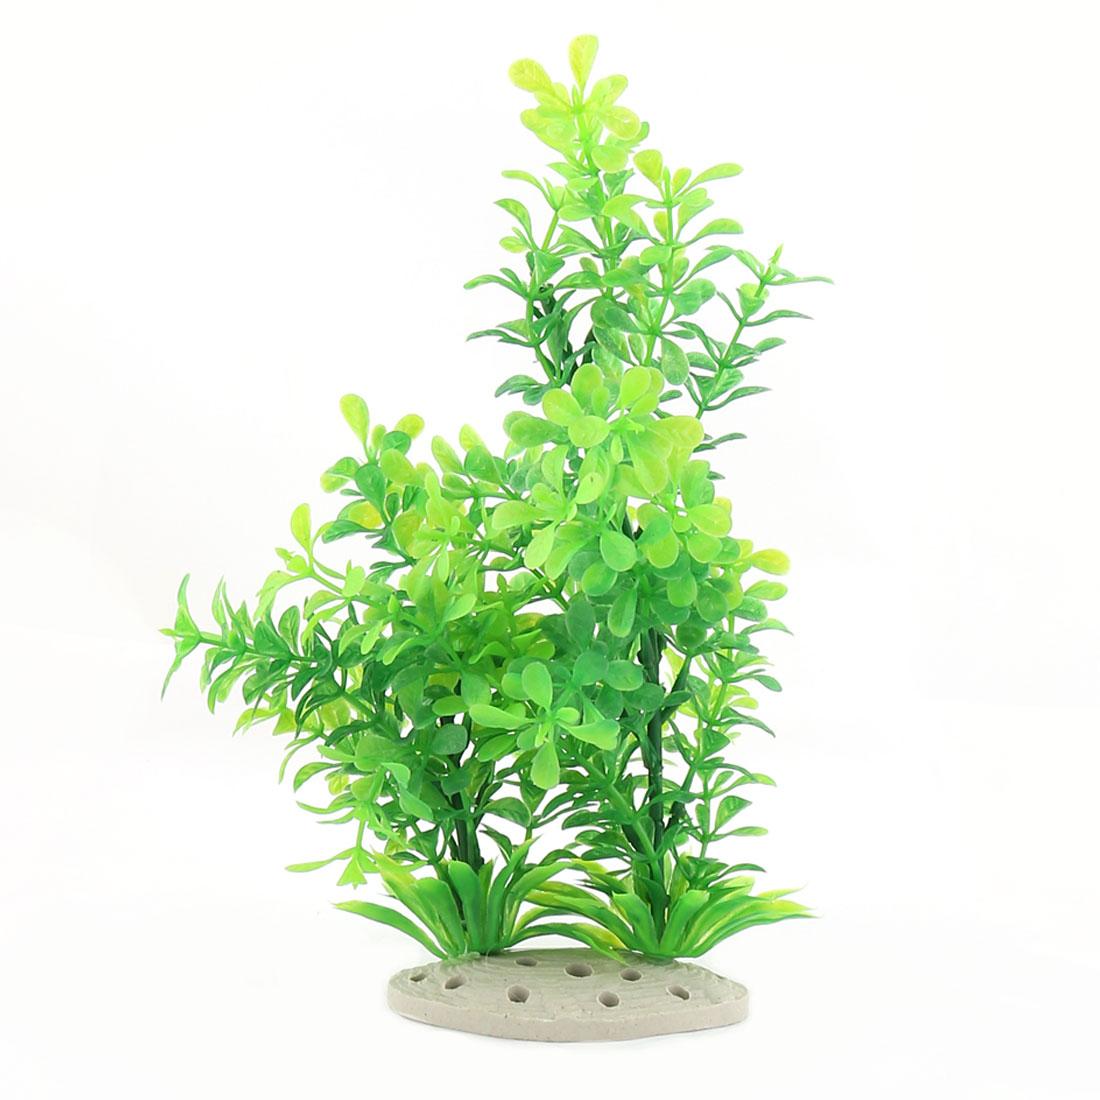 Aquarium Fish Tank Ceramic Base Plastic Artificial Fake Water Grass Plant Decor Green